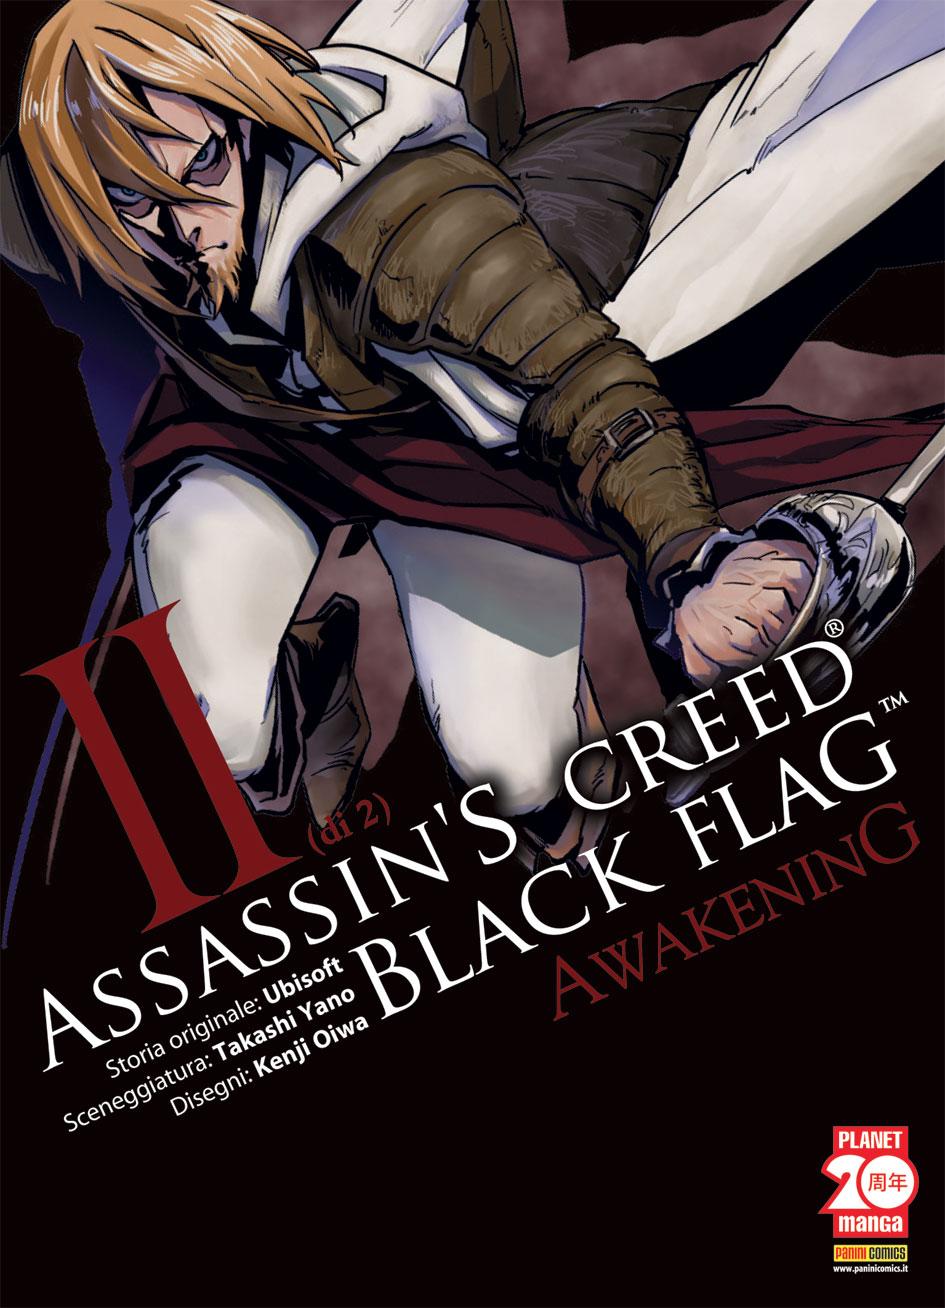 Assassin's Creed IV Black Flag: The Awakening vol. 2